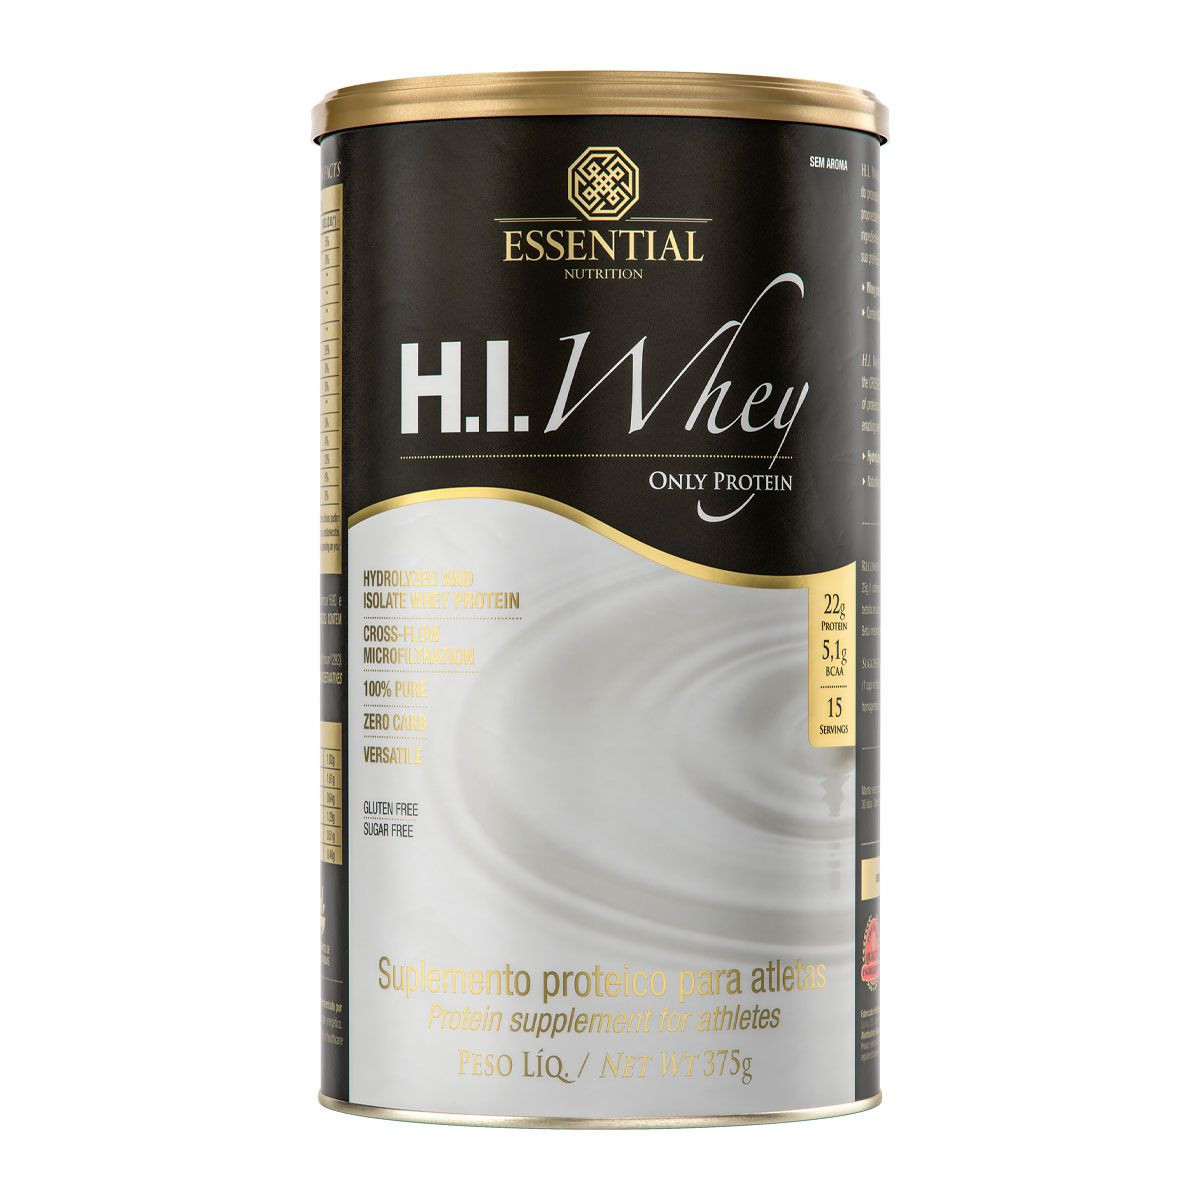 H.I. Whey 375g - Essential Nutrition